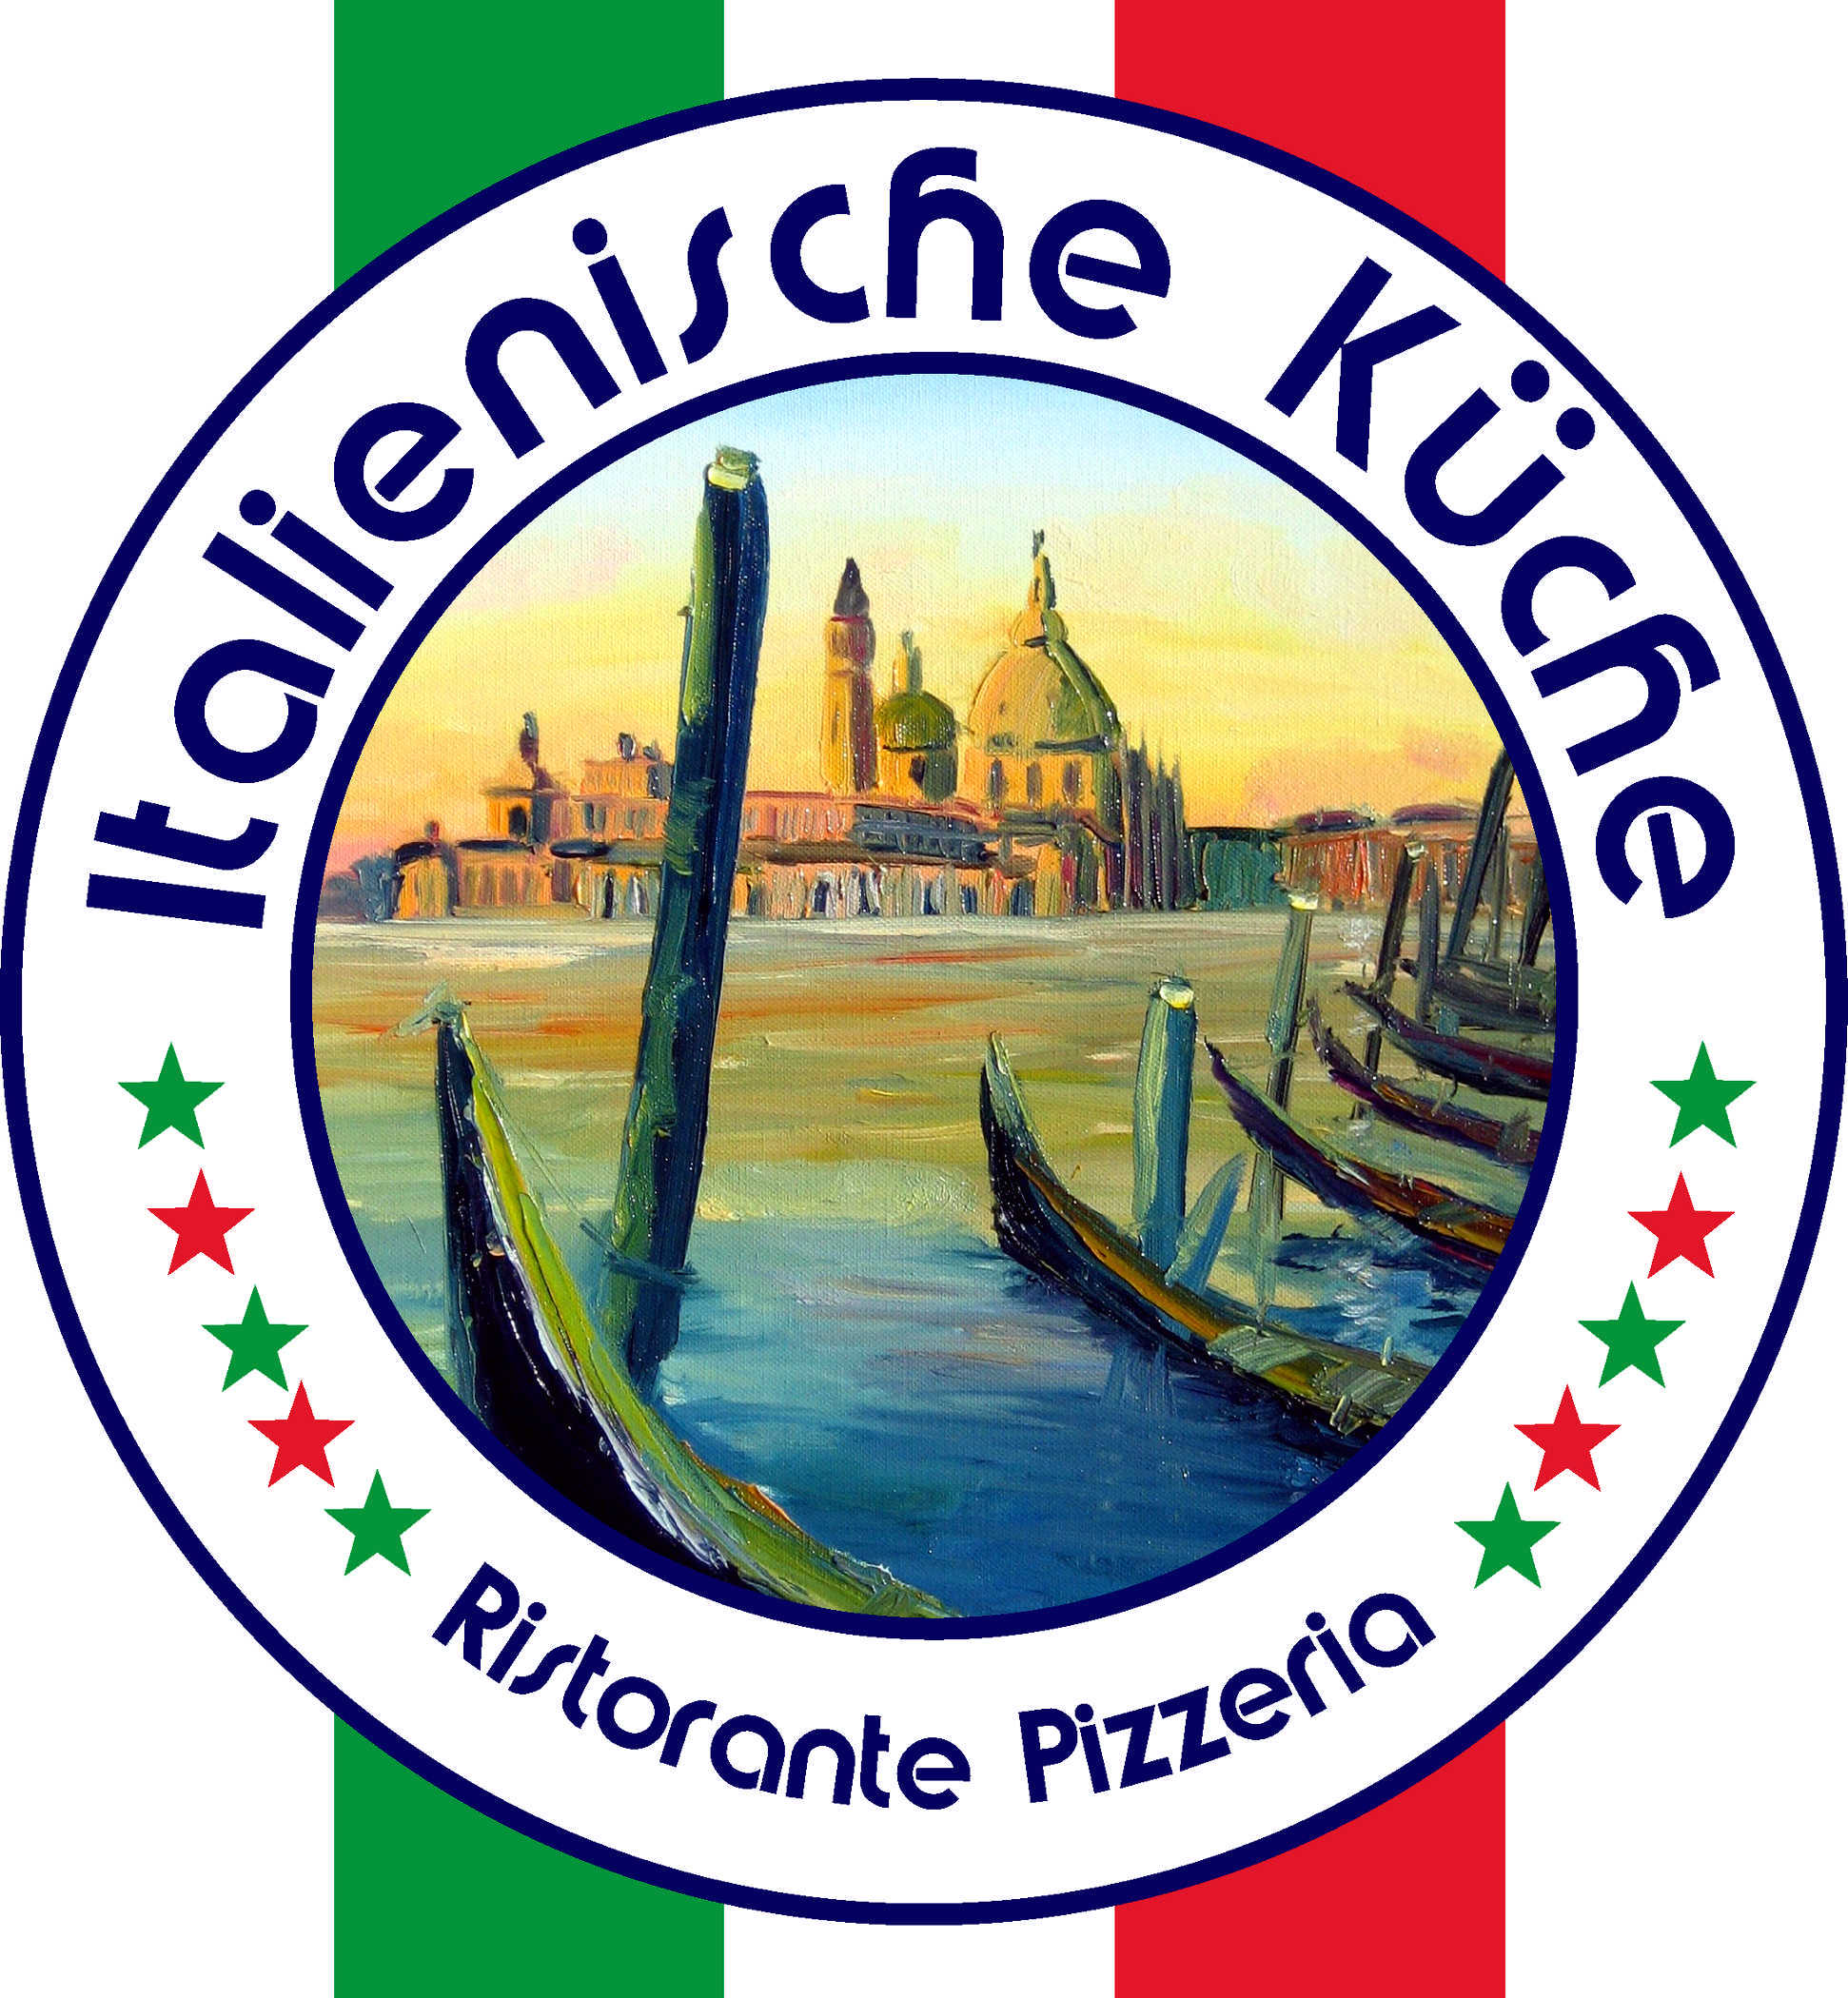 Logo Italienische Küche Ristorante Pizzeria Venezia Painting Van ...